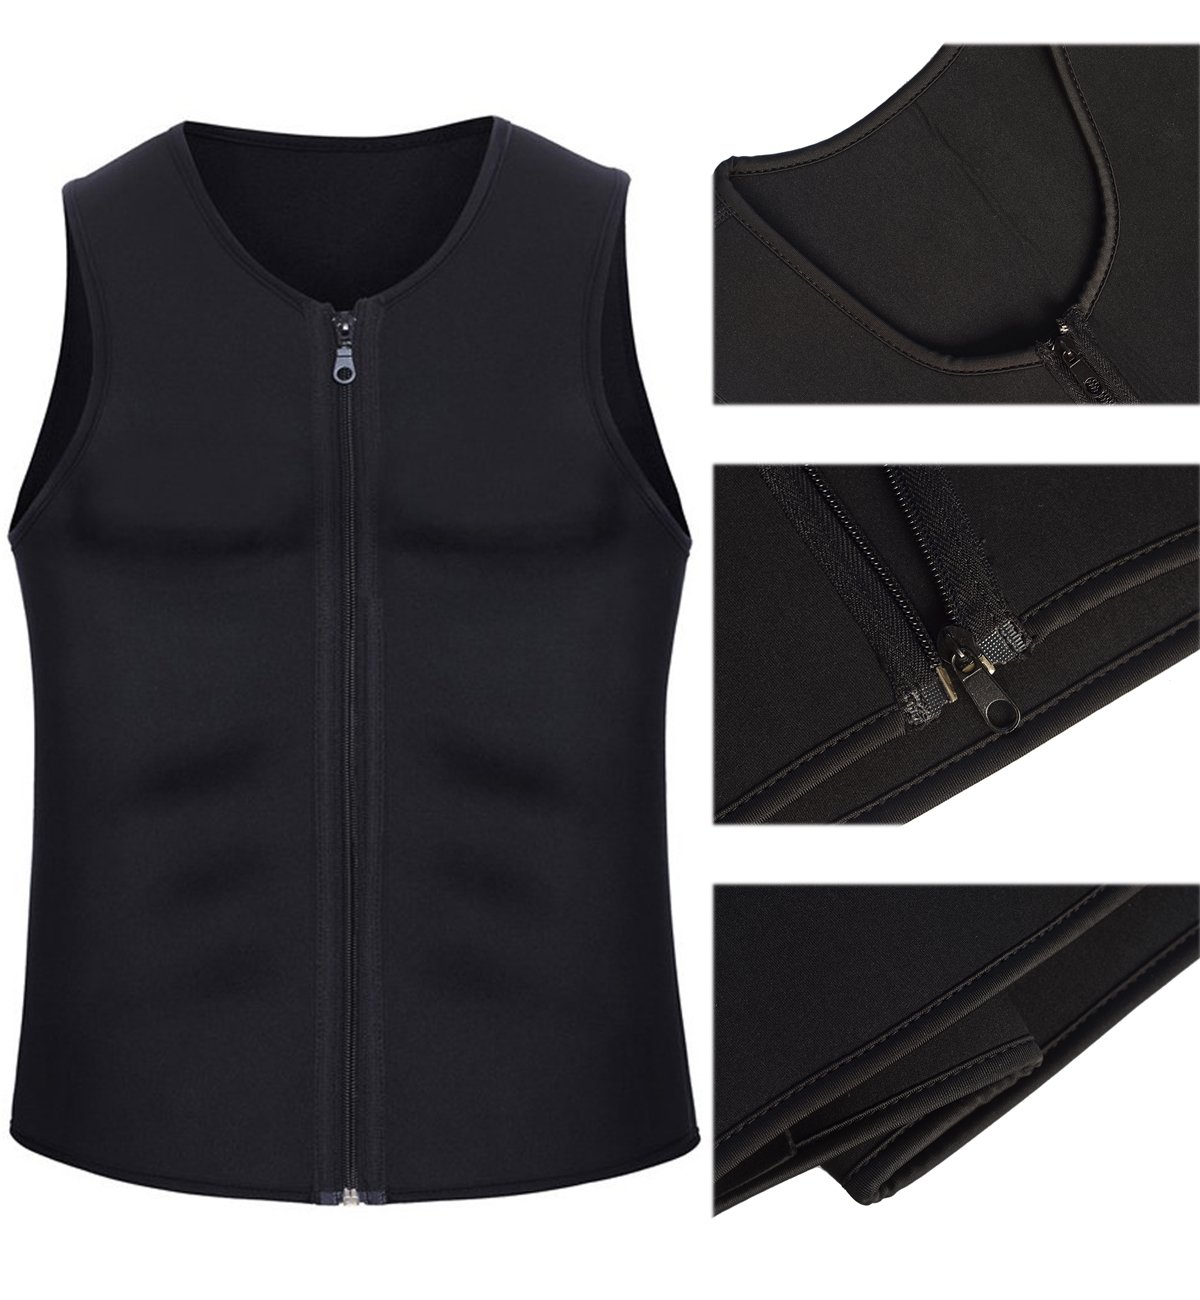 IFLOVE Mens Body Shaper Hot Sauna Vest Sweat Slimming Tank Top with Zipper for Weight Loss Fat Burner Neoprene